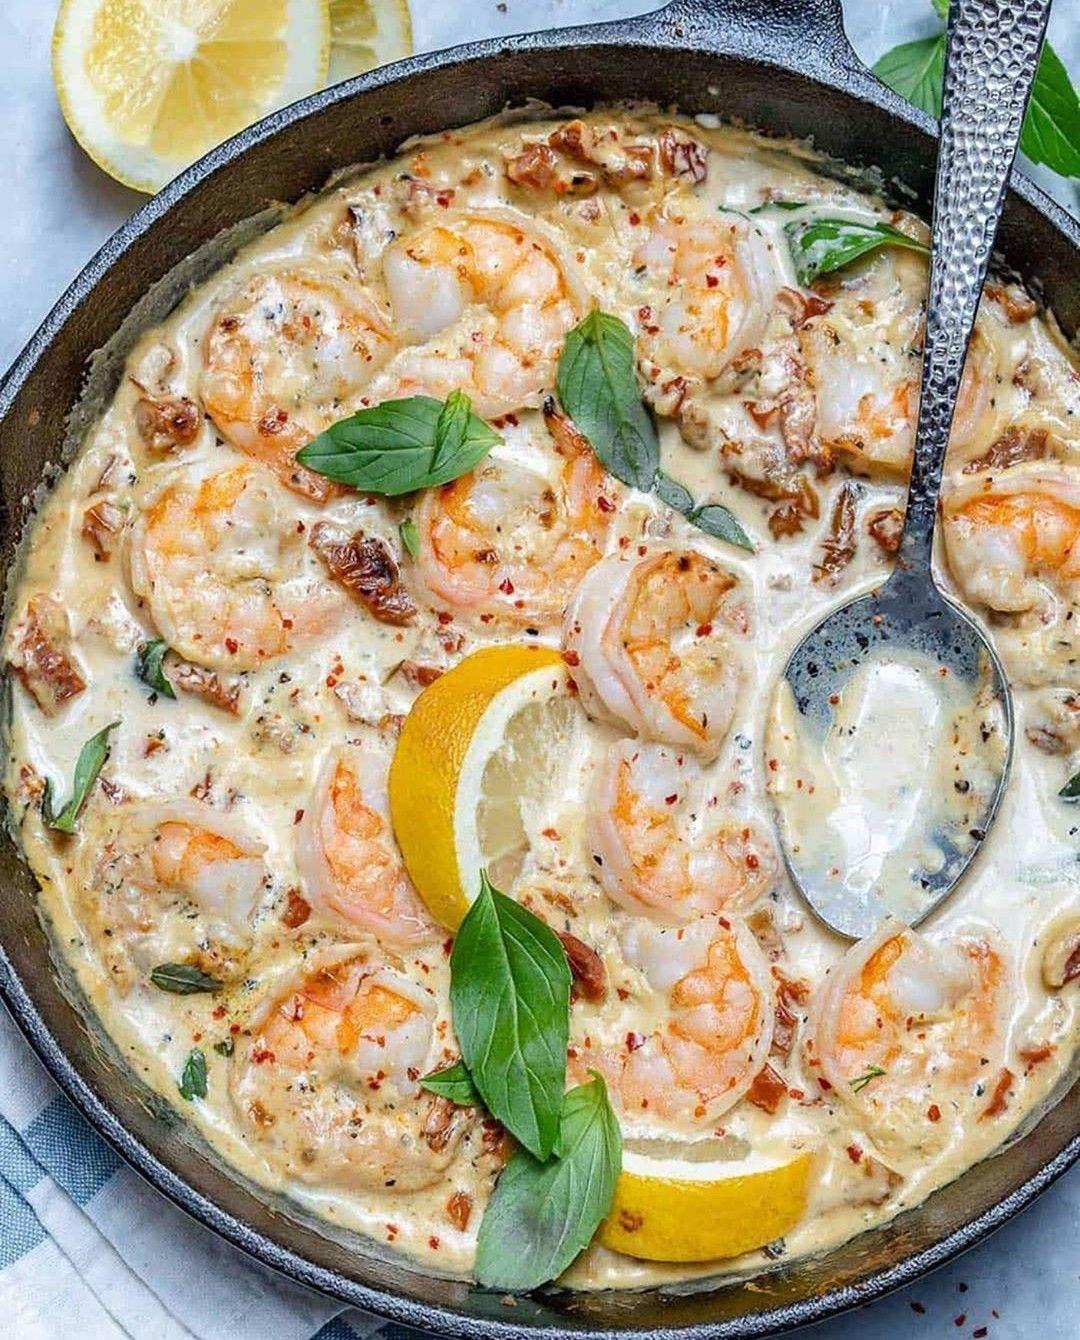 Creamy Garlic Tuscan Shrimp Keto  Creamy Garlic Tuscan Shrimp Skillet